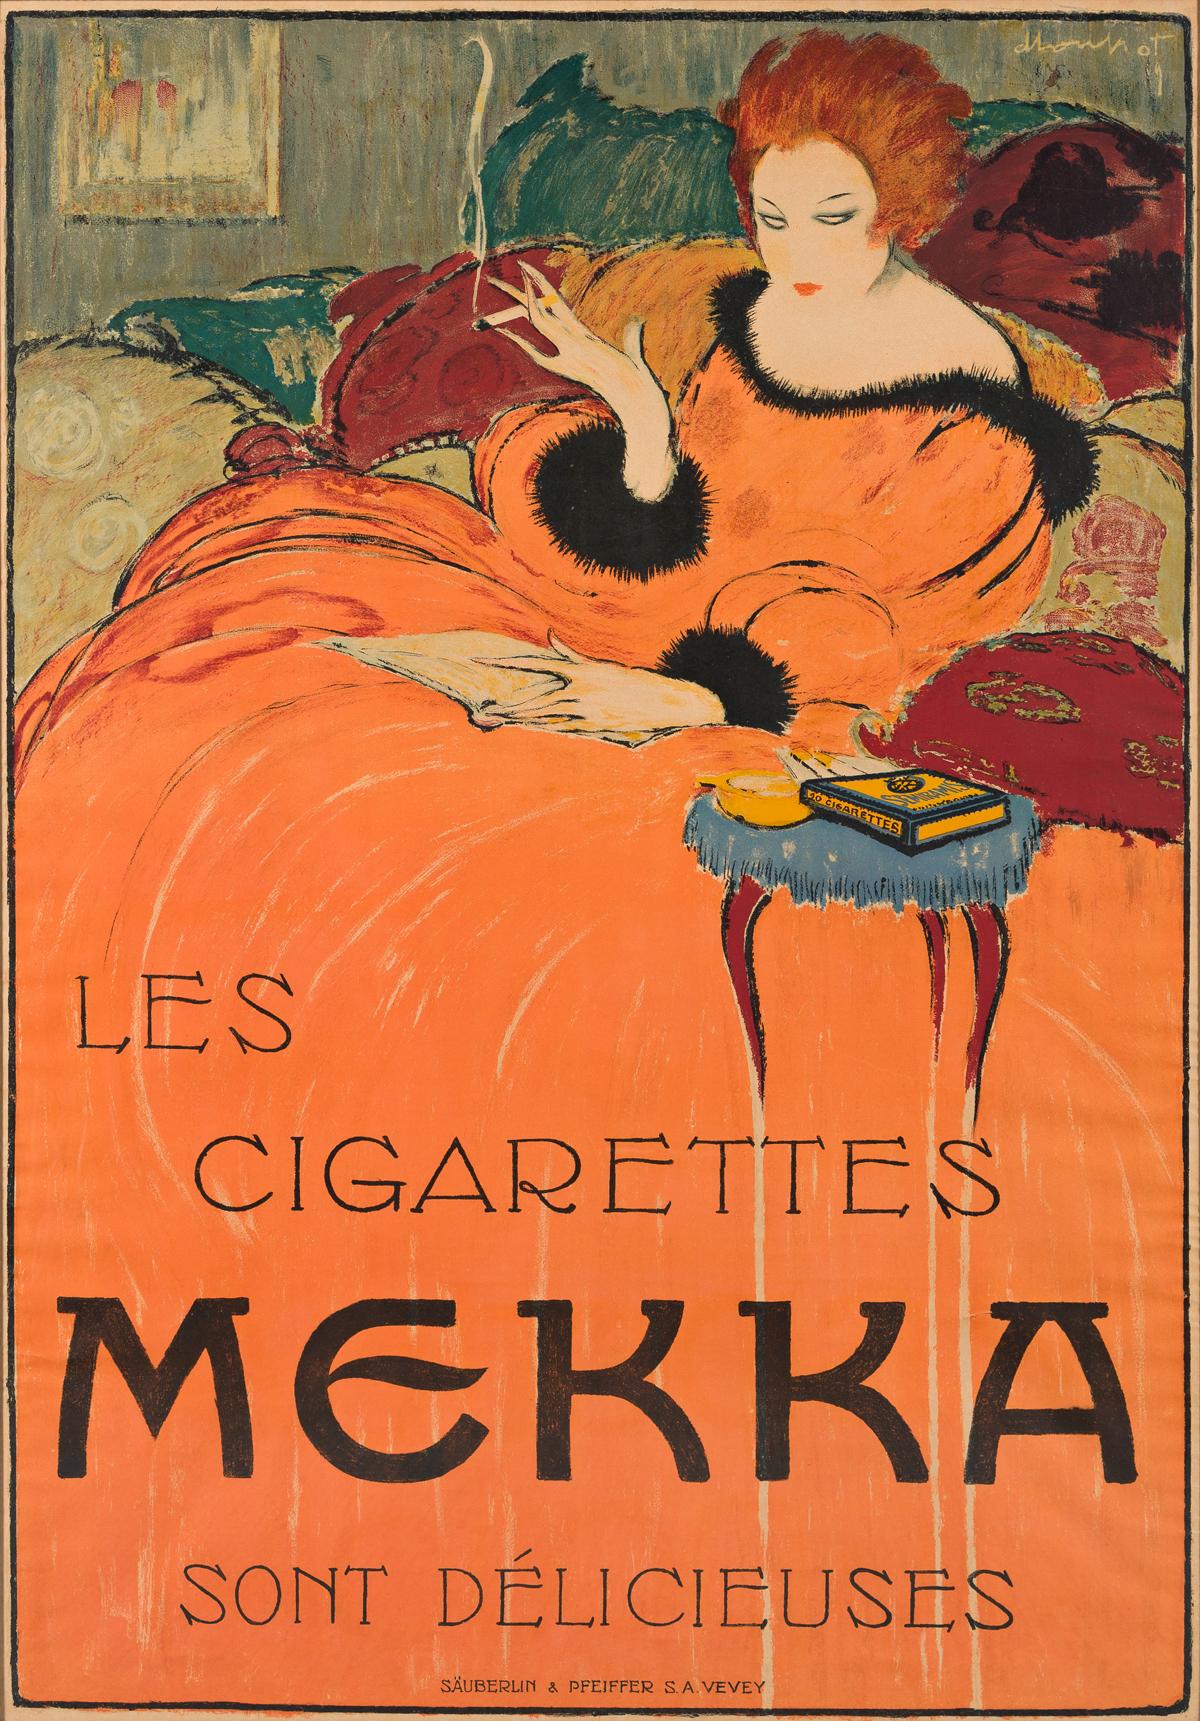 CHARLES LOUPOT (1892-1962).  LES CIGARETTES MEKKA. 1919. 50x34½ inches, 127x87½ cm. Säuberlin & Pfeiffer, Vevey.